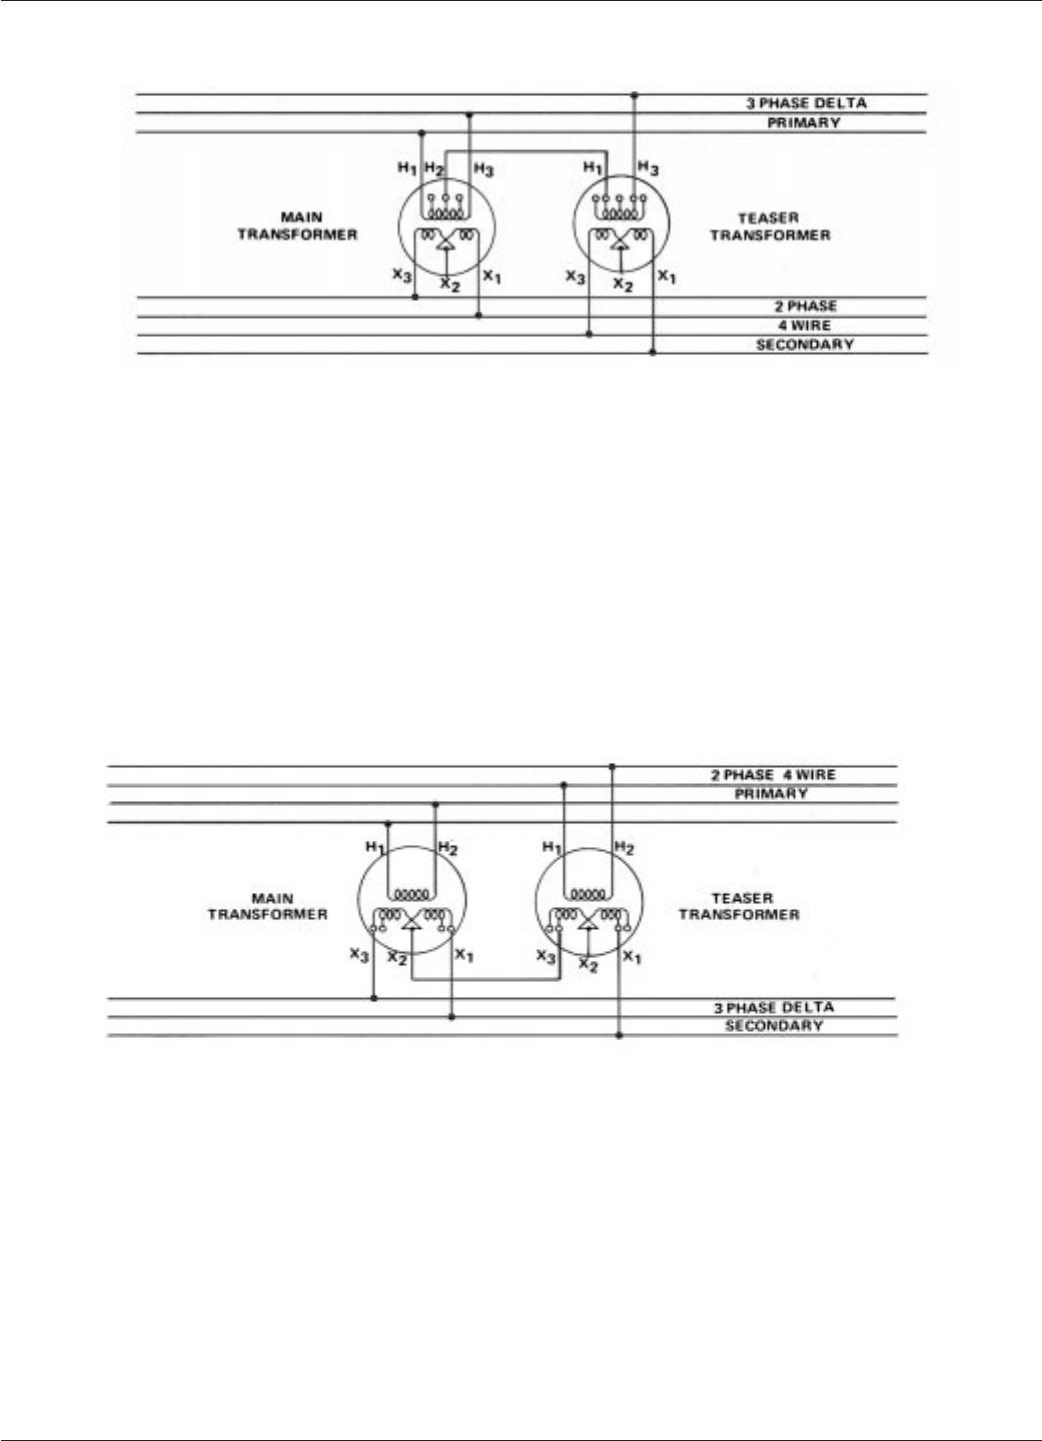 12470 3 Phase 4 Wire High Side Diagram Underwater Welding Diagram 7ways Ab12 Jeanjaures37 Fr